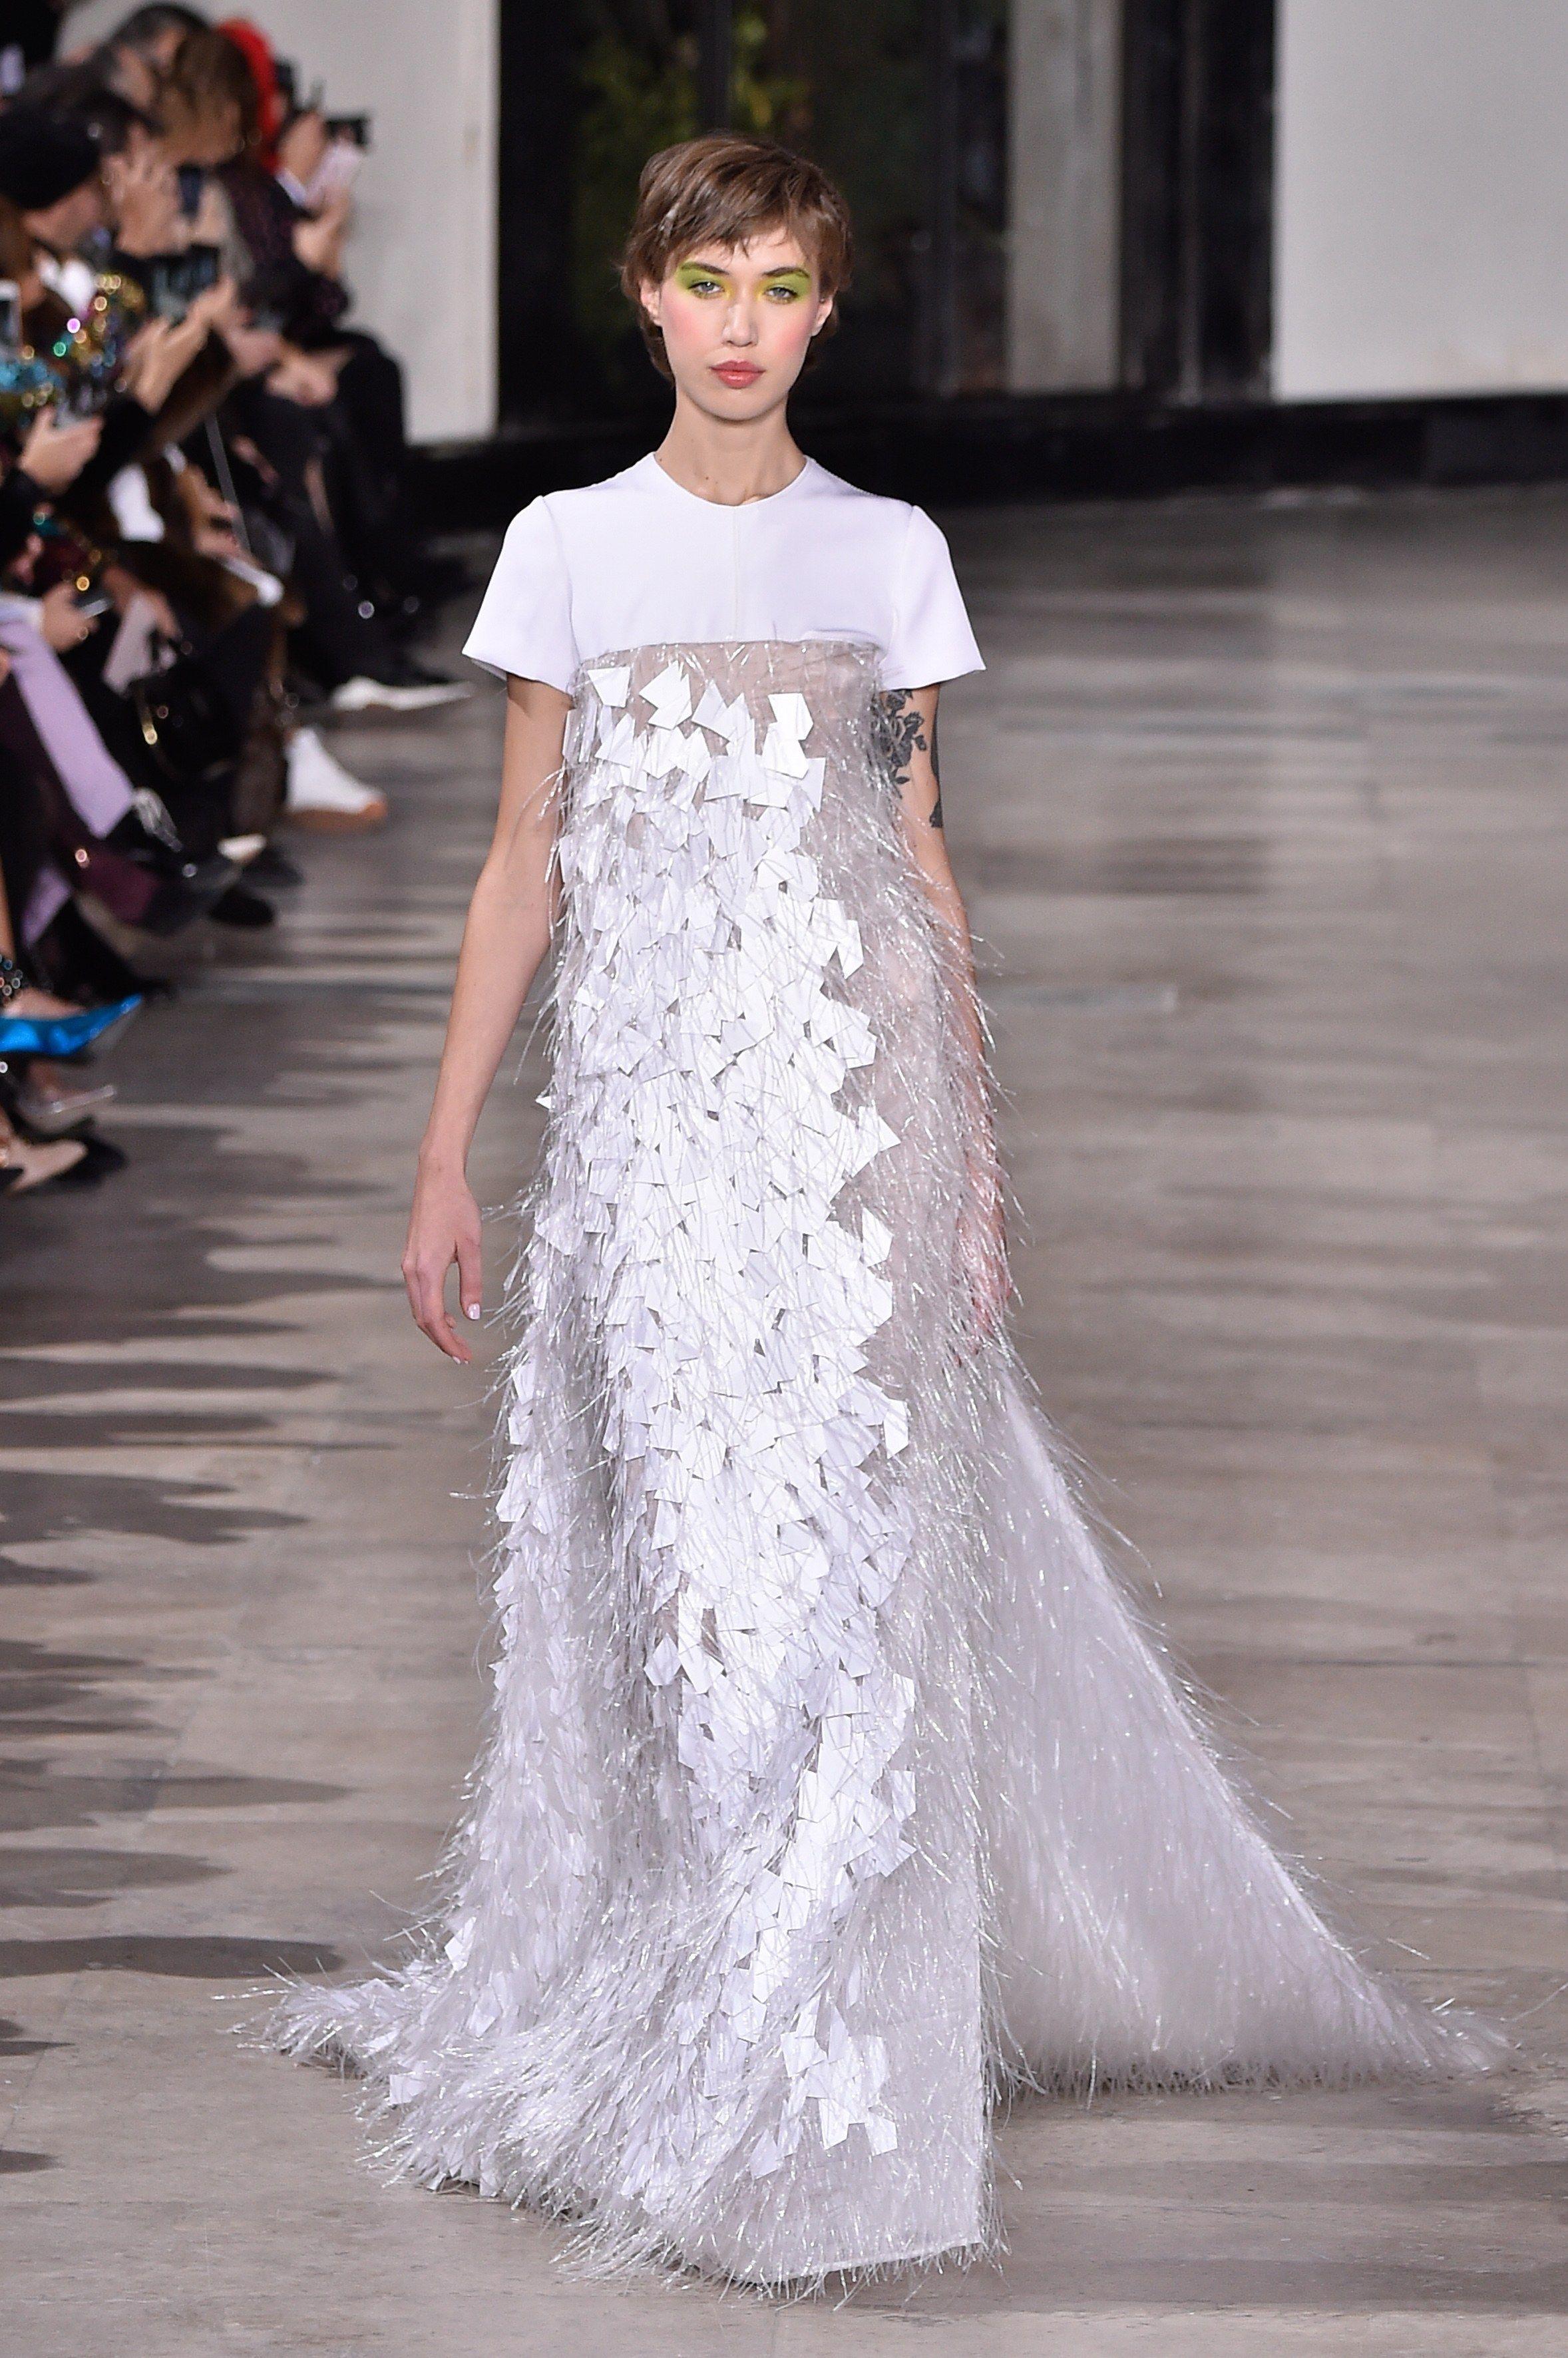 Model Gaun Kebaya Unik